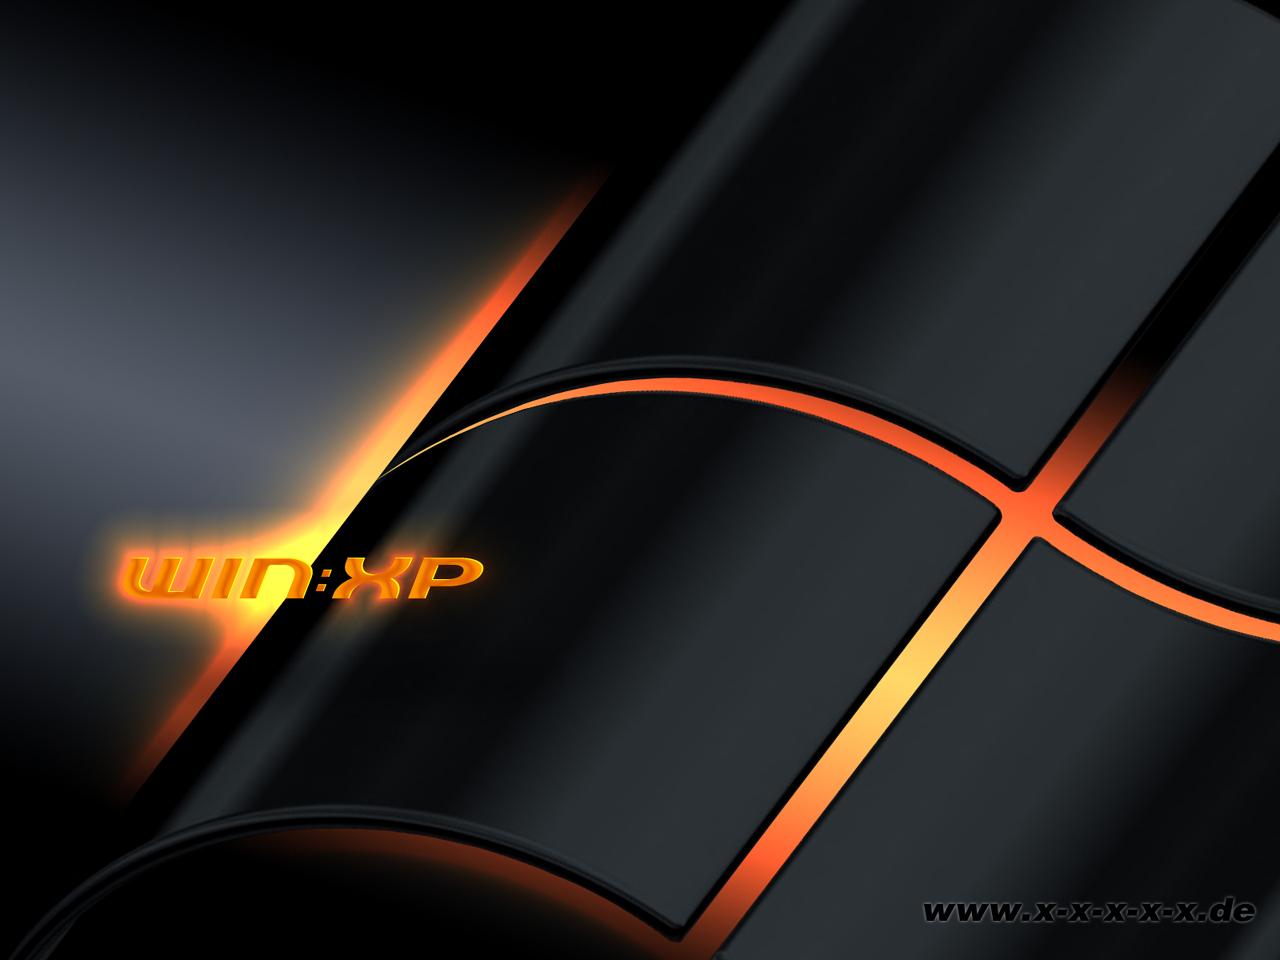 http://3.bp.blogspot.com/-AJaSa5KF7nE/TxJGwT-LXUI/AAAAAAAACtc/Fv_BfyhFMcI/s1600/Pictures+Windows+XP.jpg